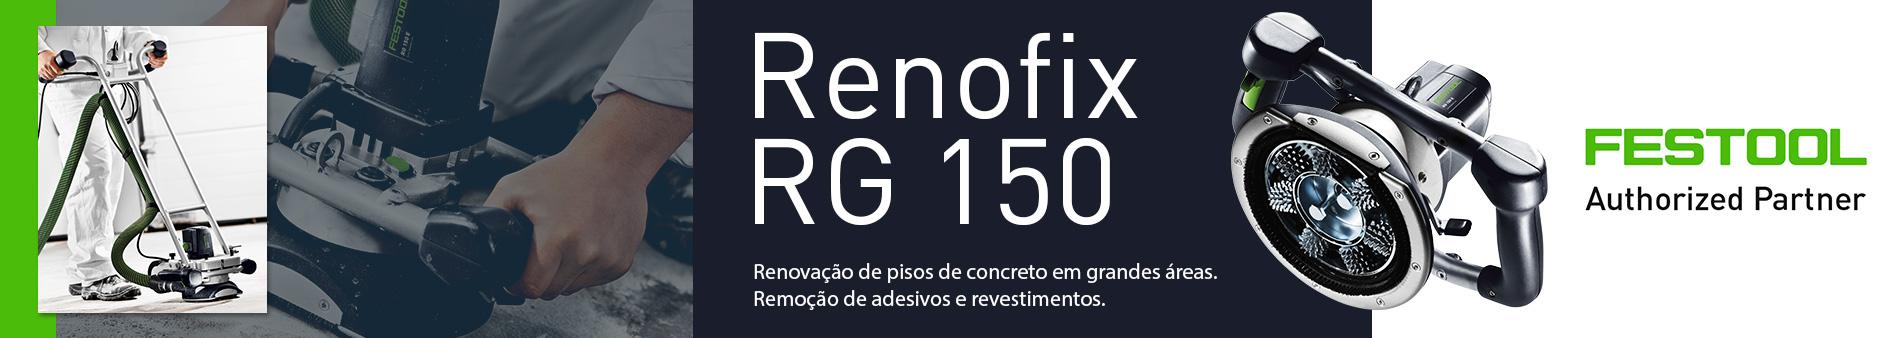 Job_2018_BANNER-SITE-Renofix-RG150